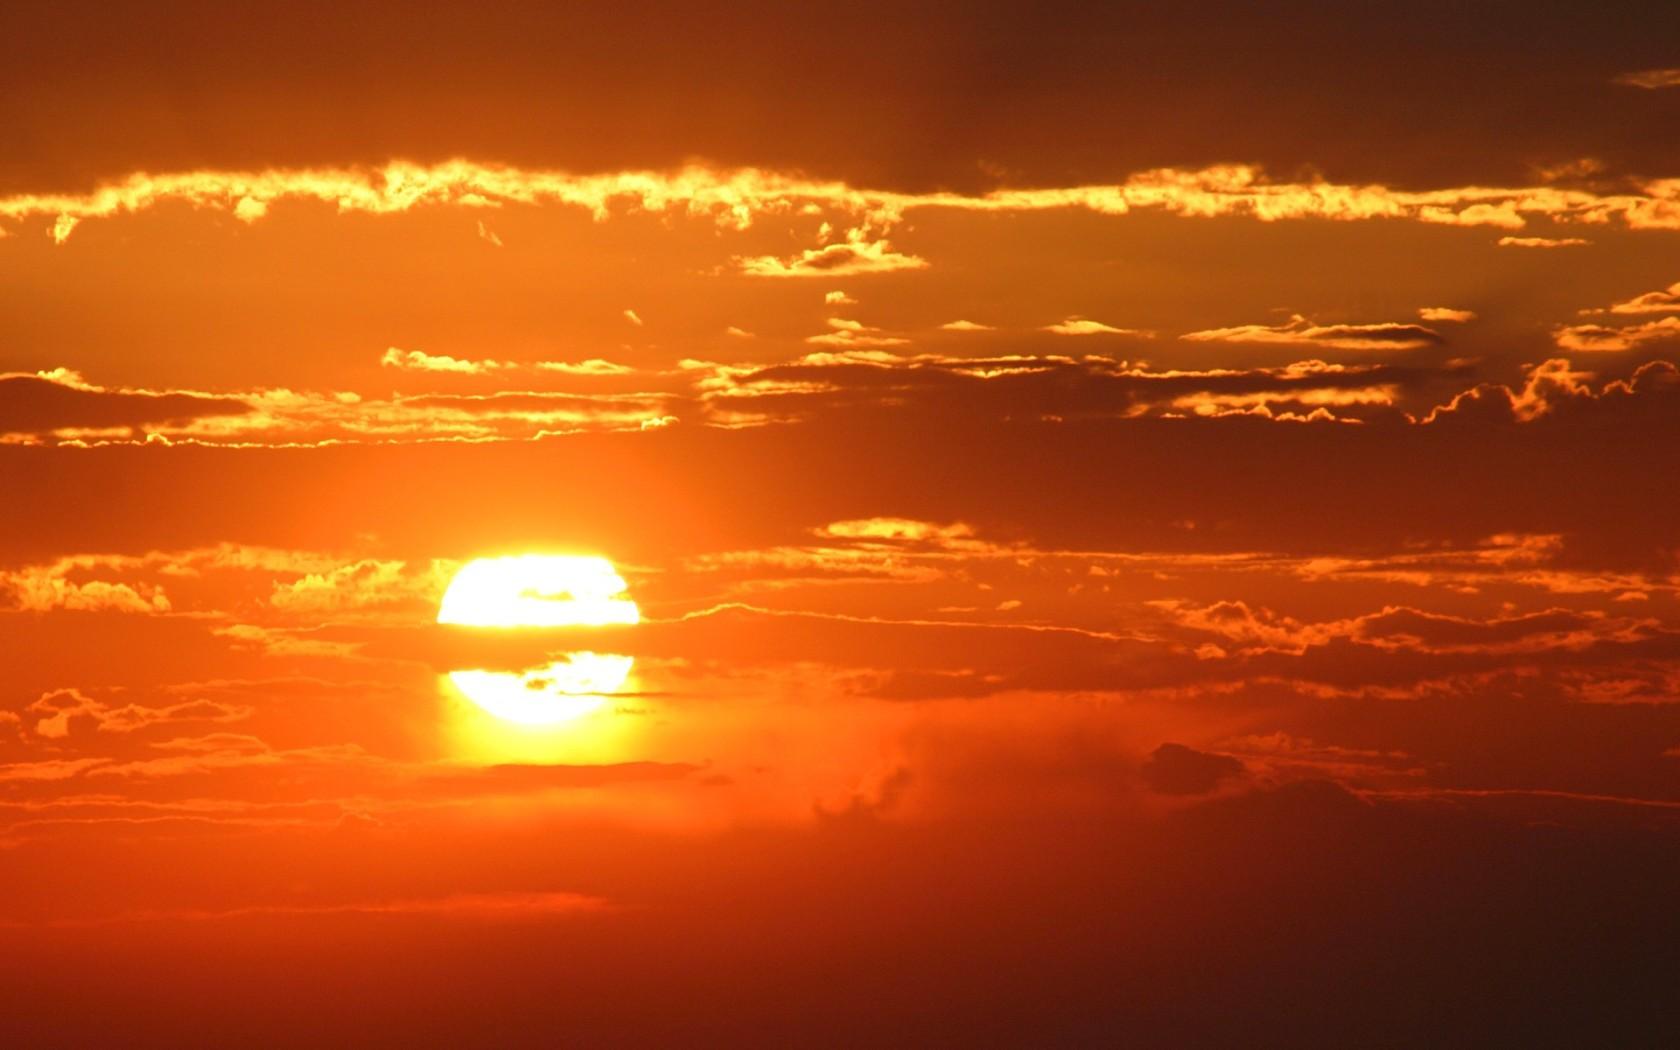 orange sunset wallpaper 1680x1050 60068